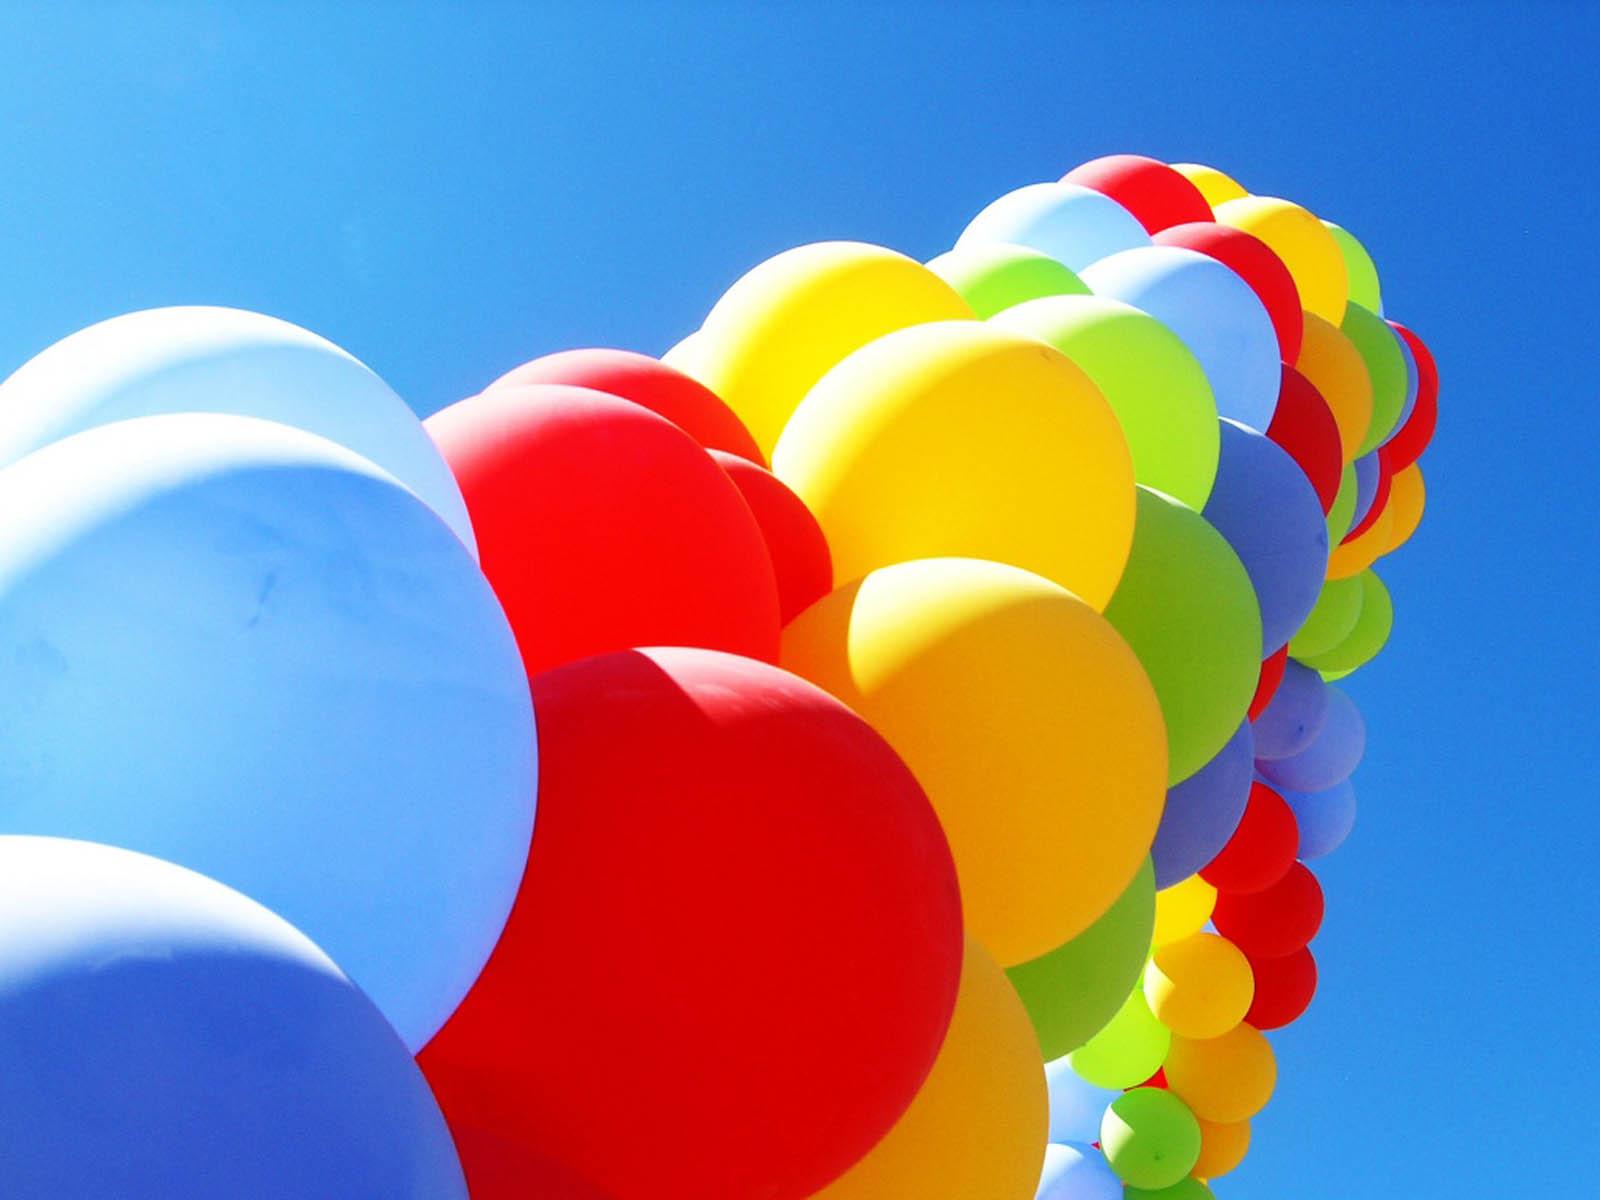 Gambar-Gambar Balon dengan Warna Warni Cantik